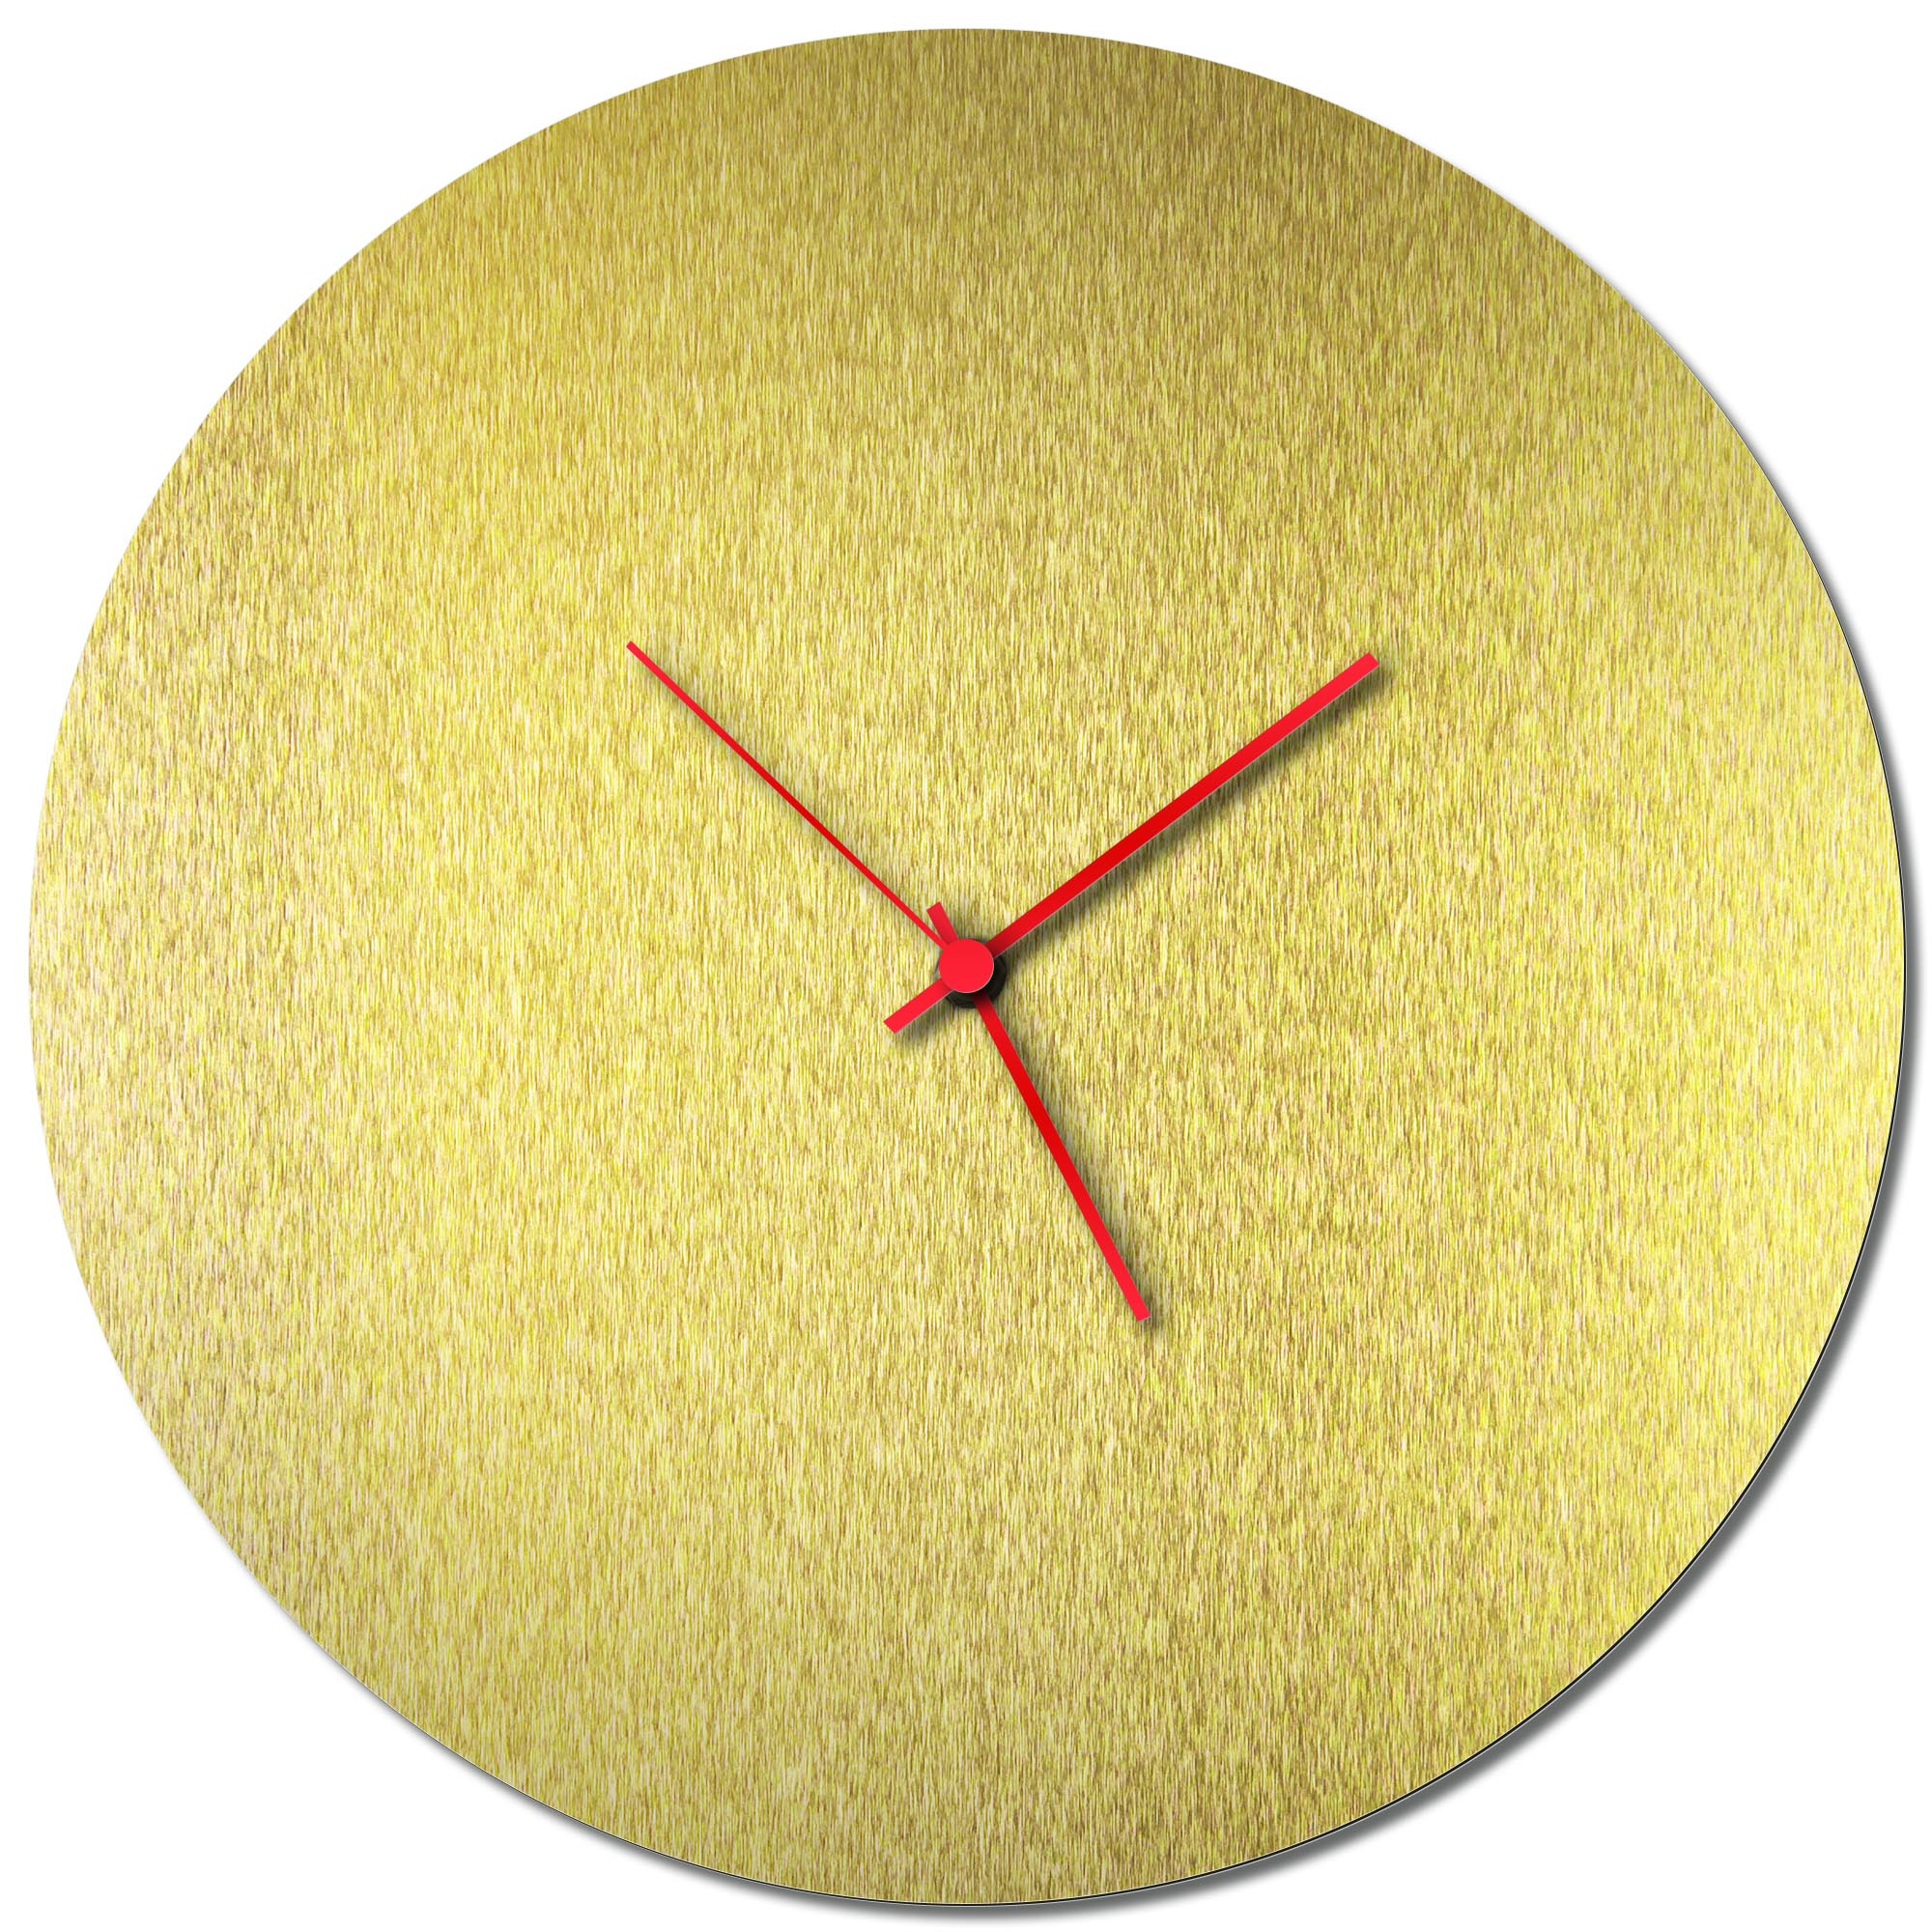 Adam Schwoeppe 'Goldsmith Circle Clock Large Red' Midcentury Modern Style Wall Clock